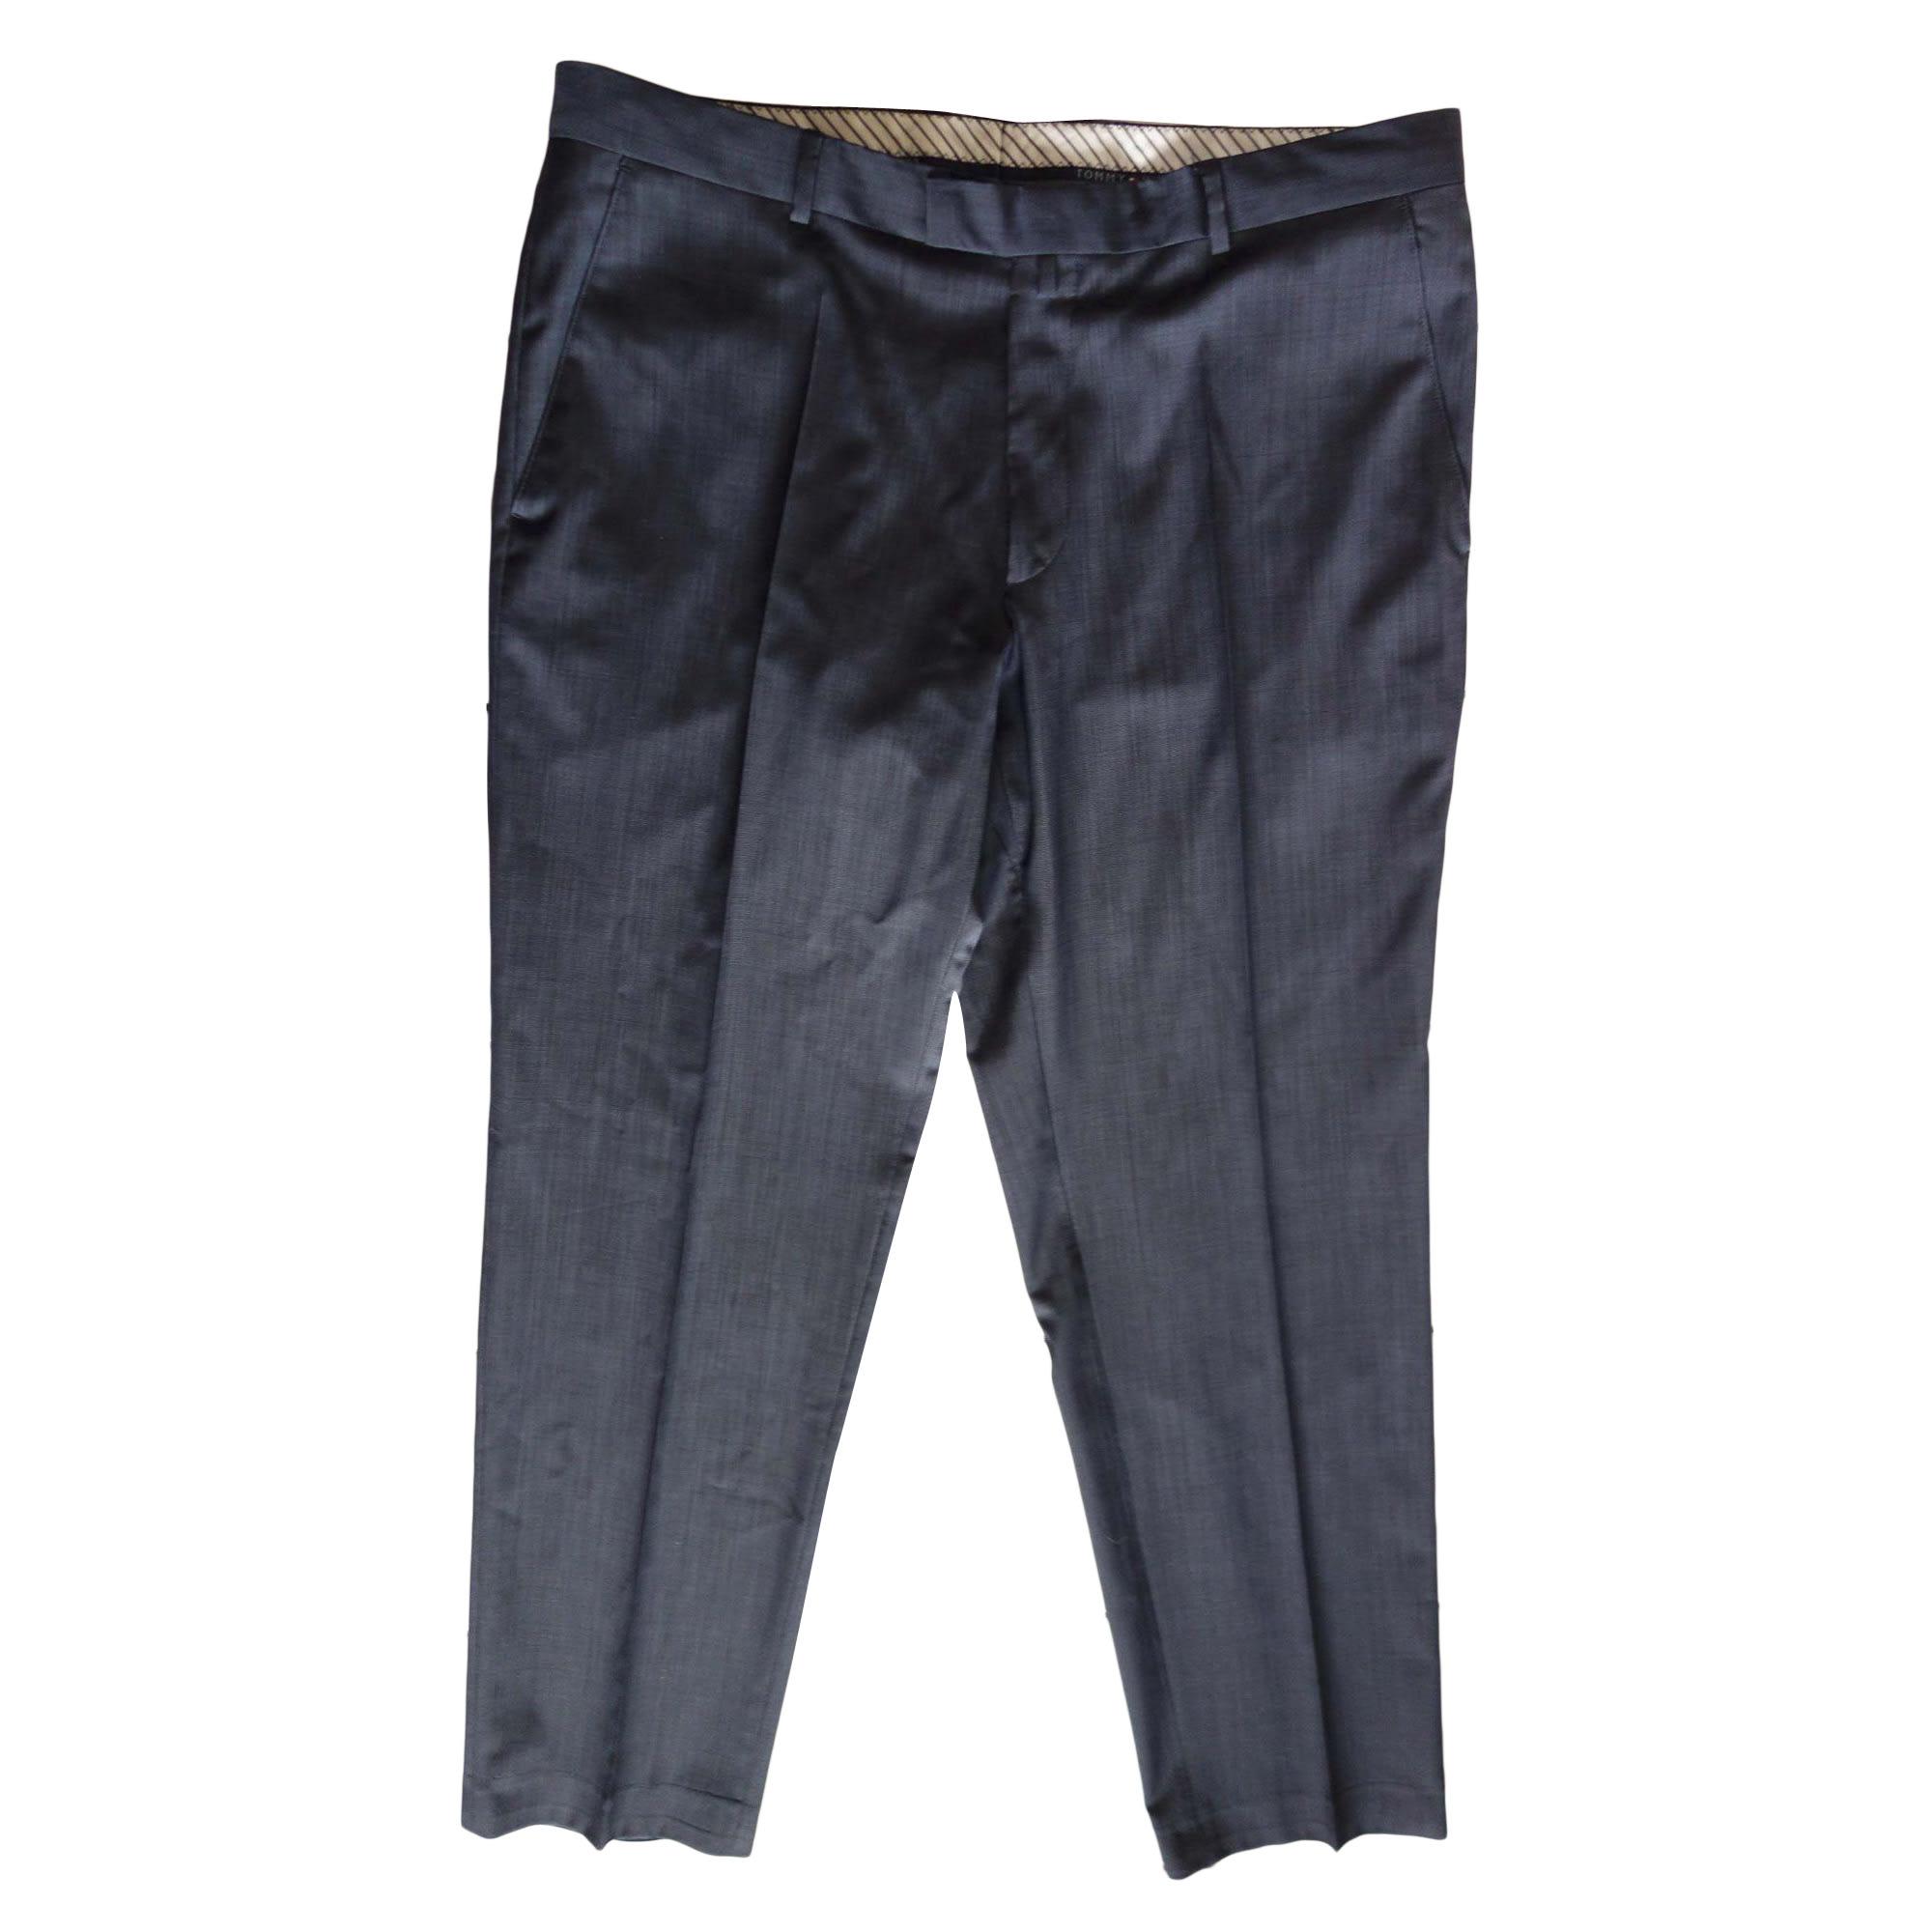 Pantalon droit TOMMY HILFIGER Bleu, bleu marine, bleu turquoise